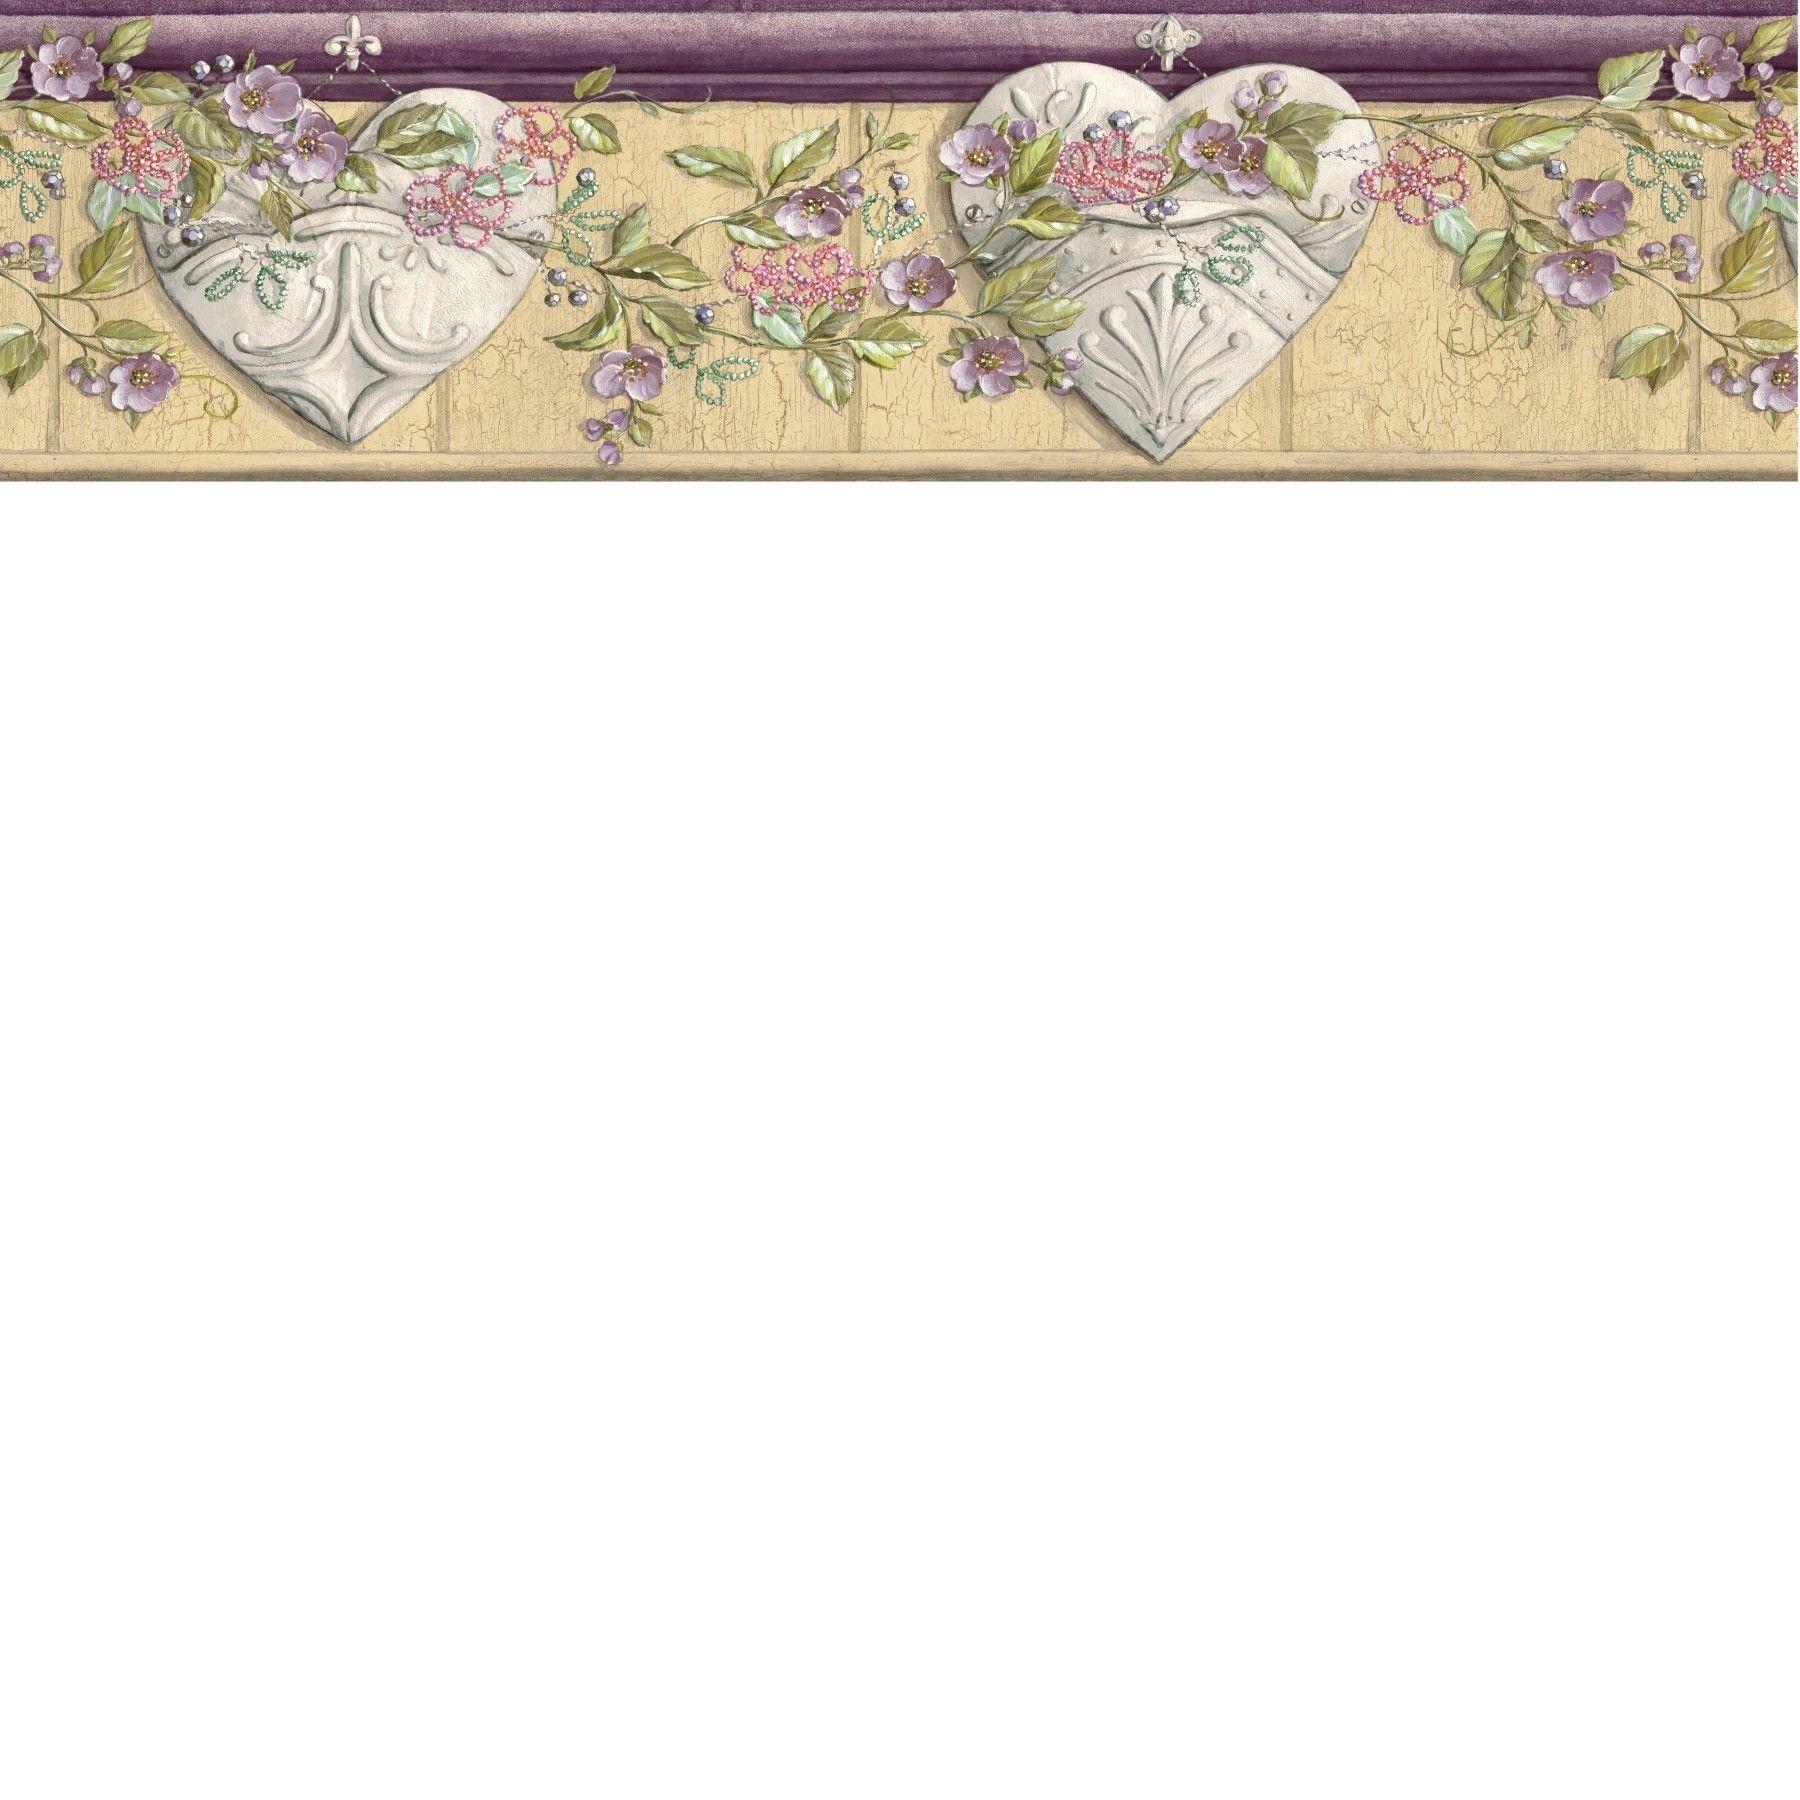 Border Name Ceiling Tin Hearts Pattern AAI08133B Border